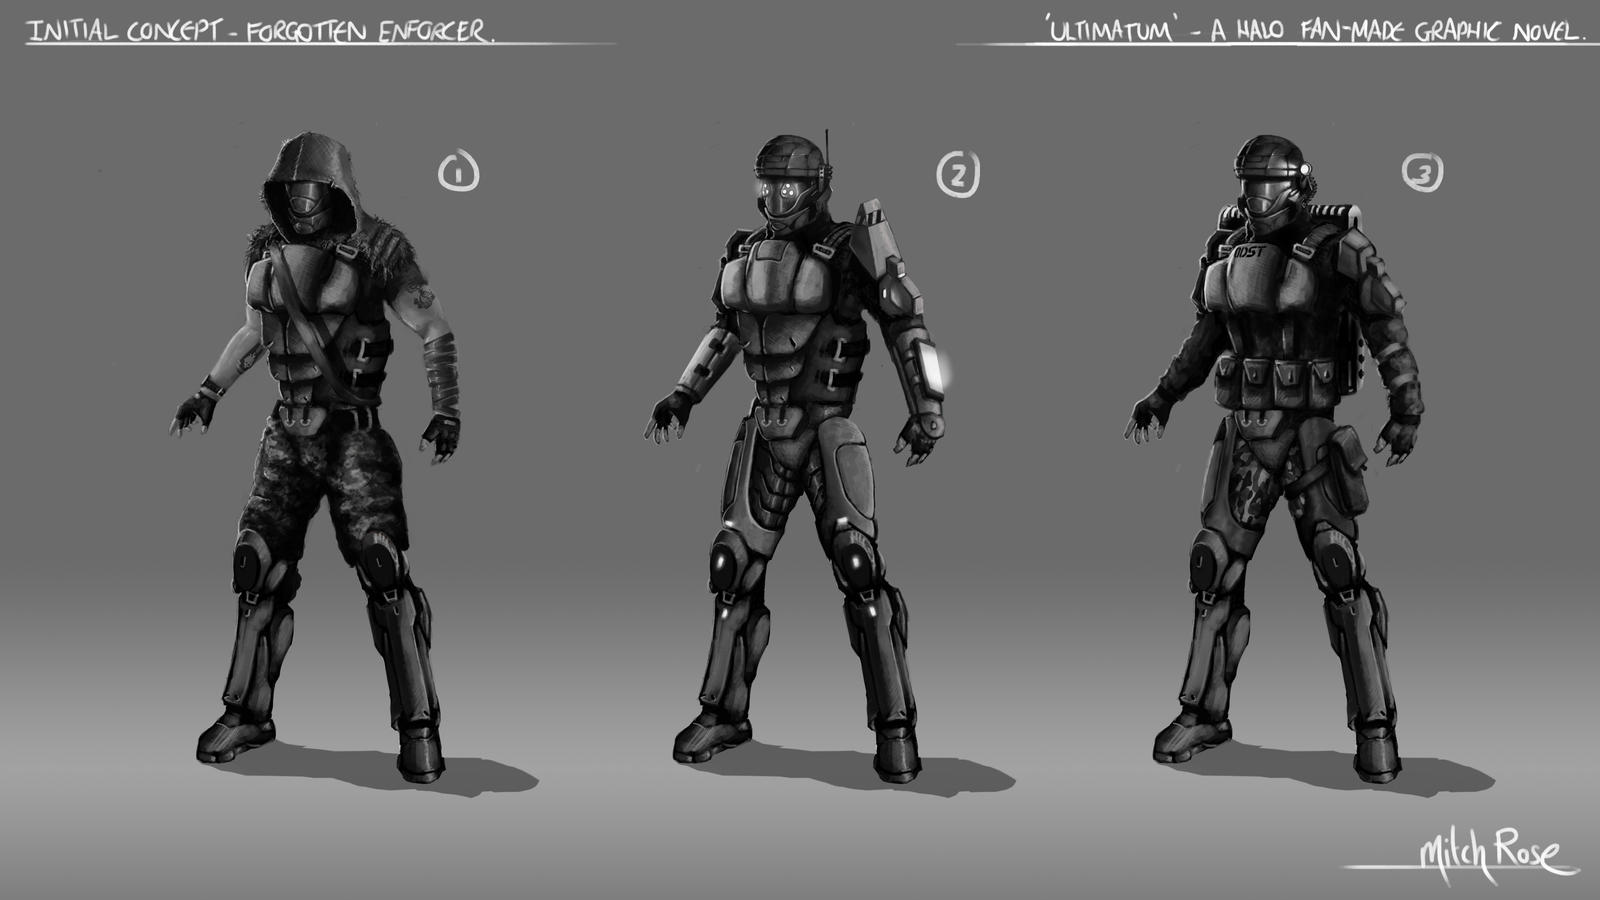 Concept - Forgotten Enforcer by GhilliedNinja